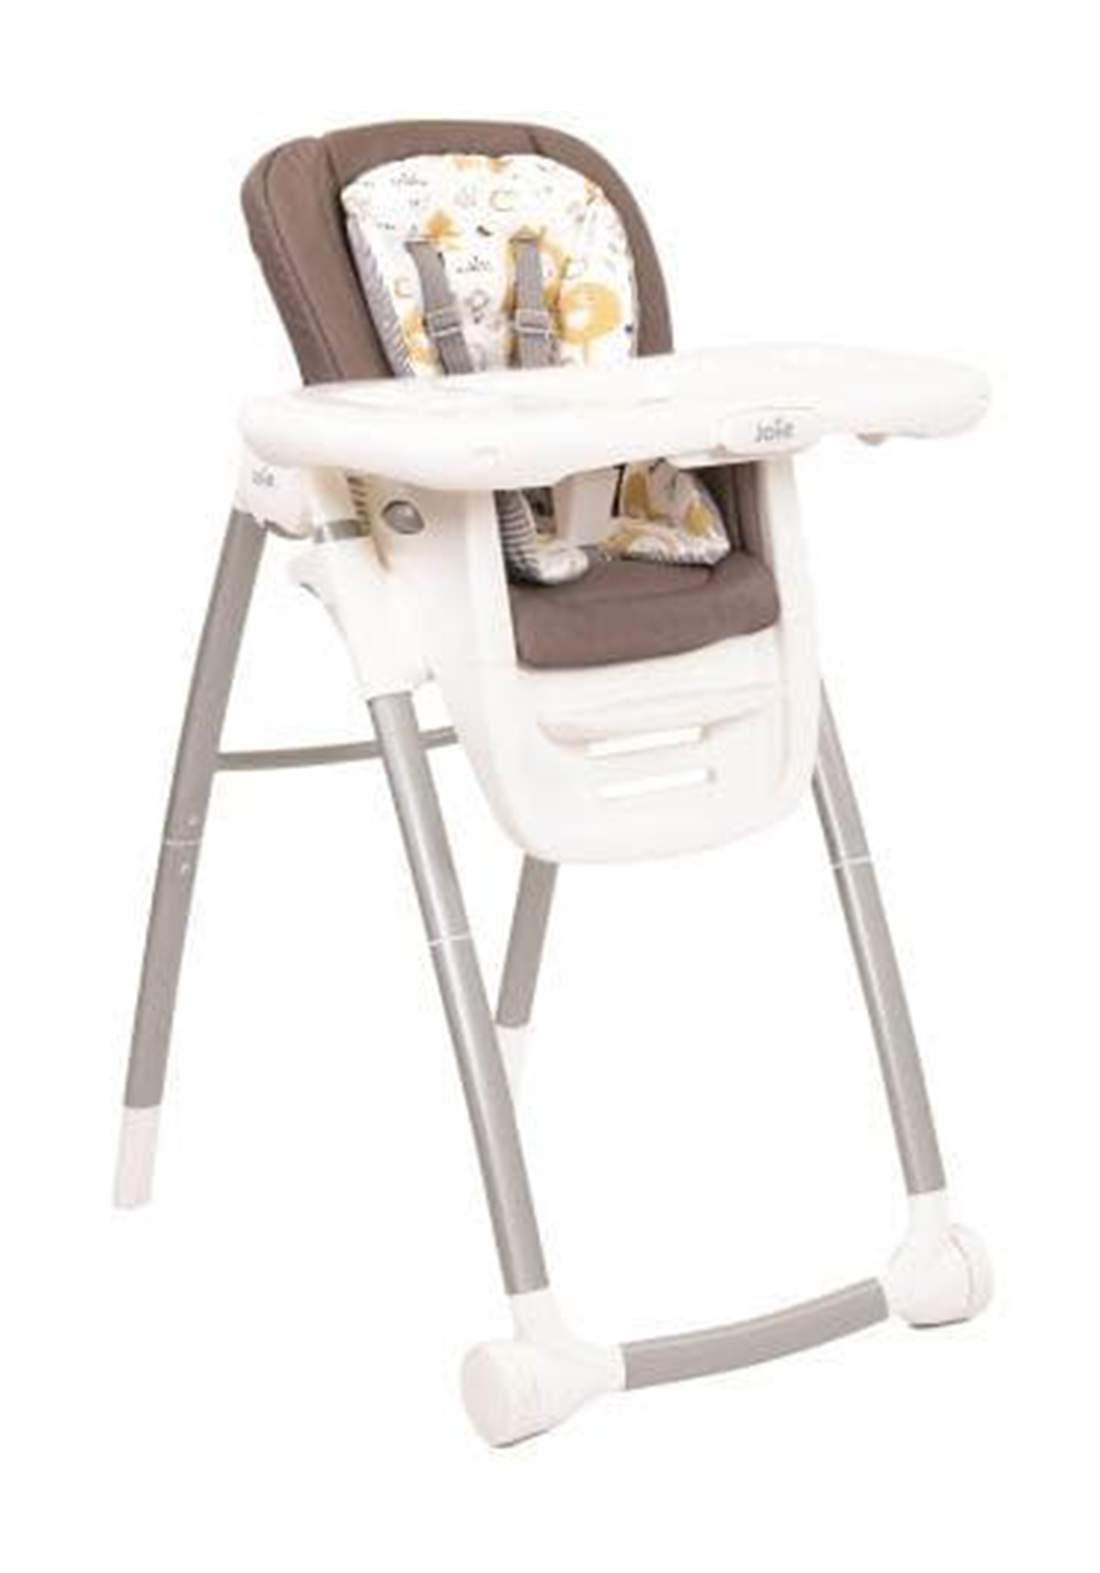 كرسي طعام للاطفال Joie Baby H1605AACOZ000HC Multiply 6in1 Cozy Spaces